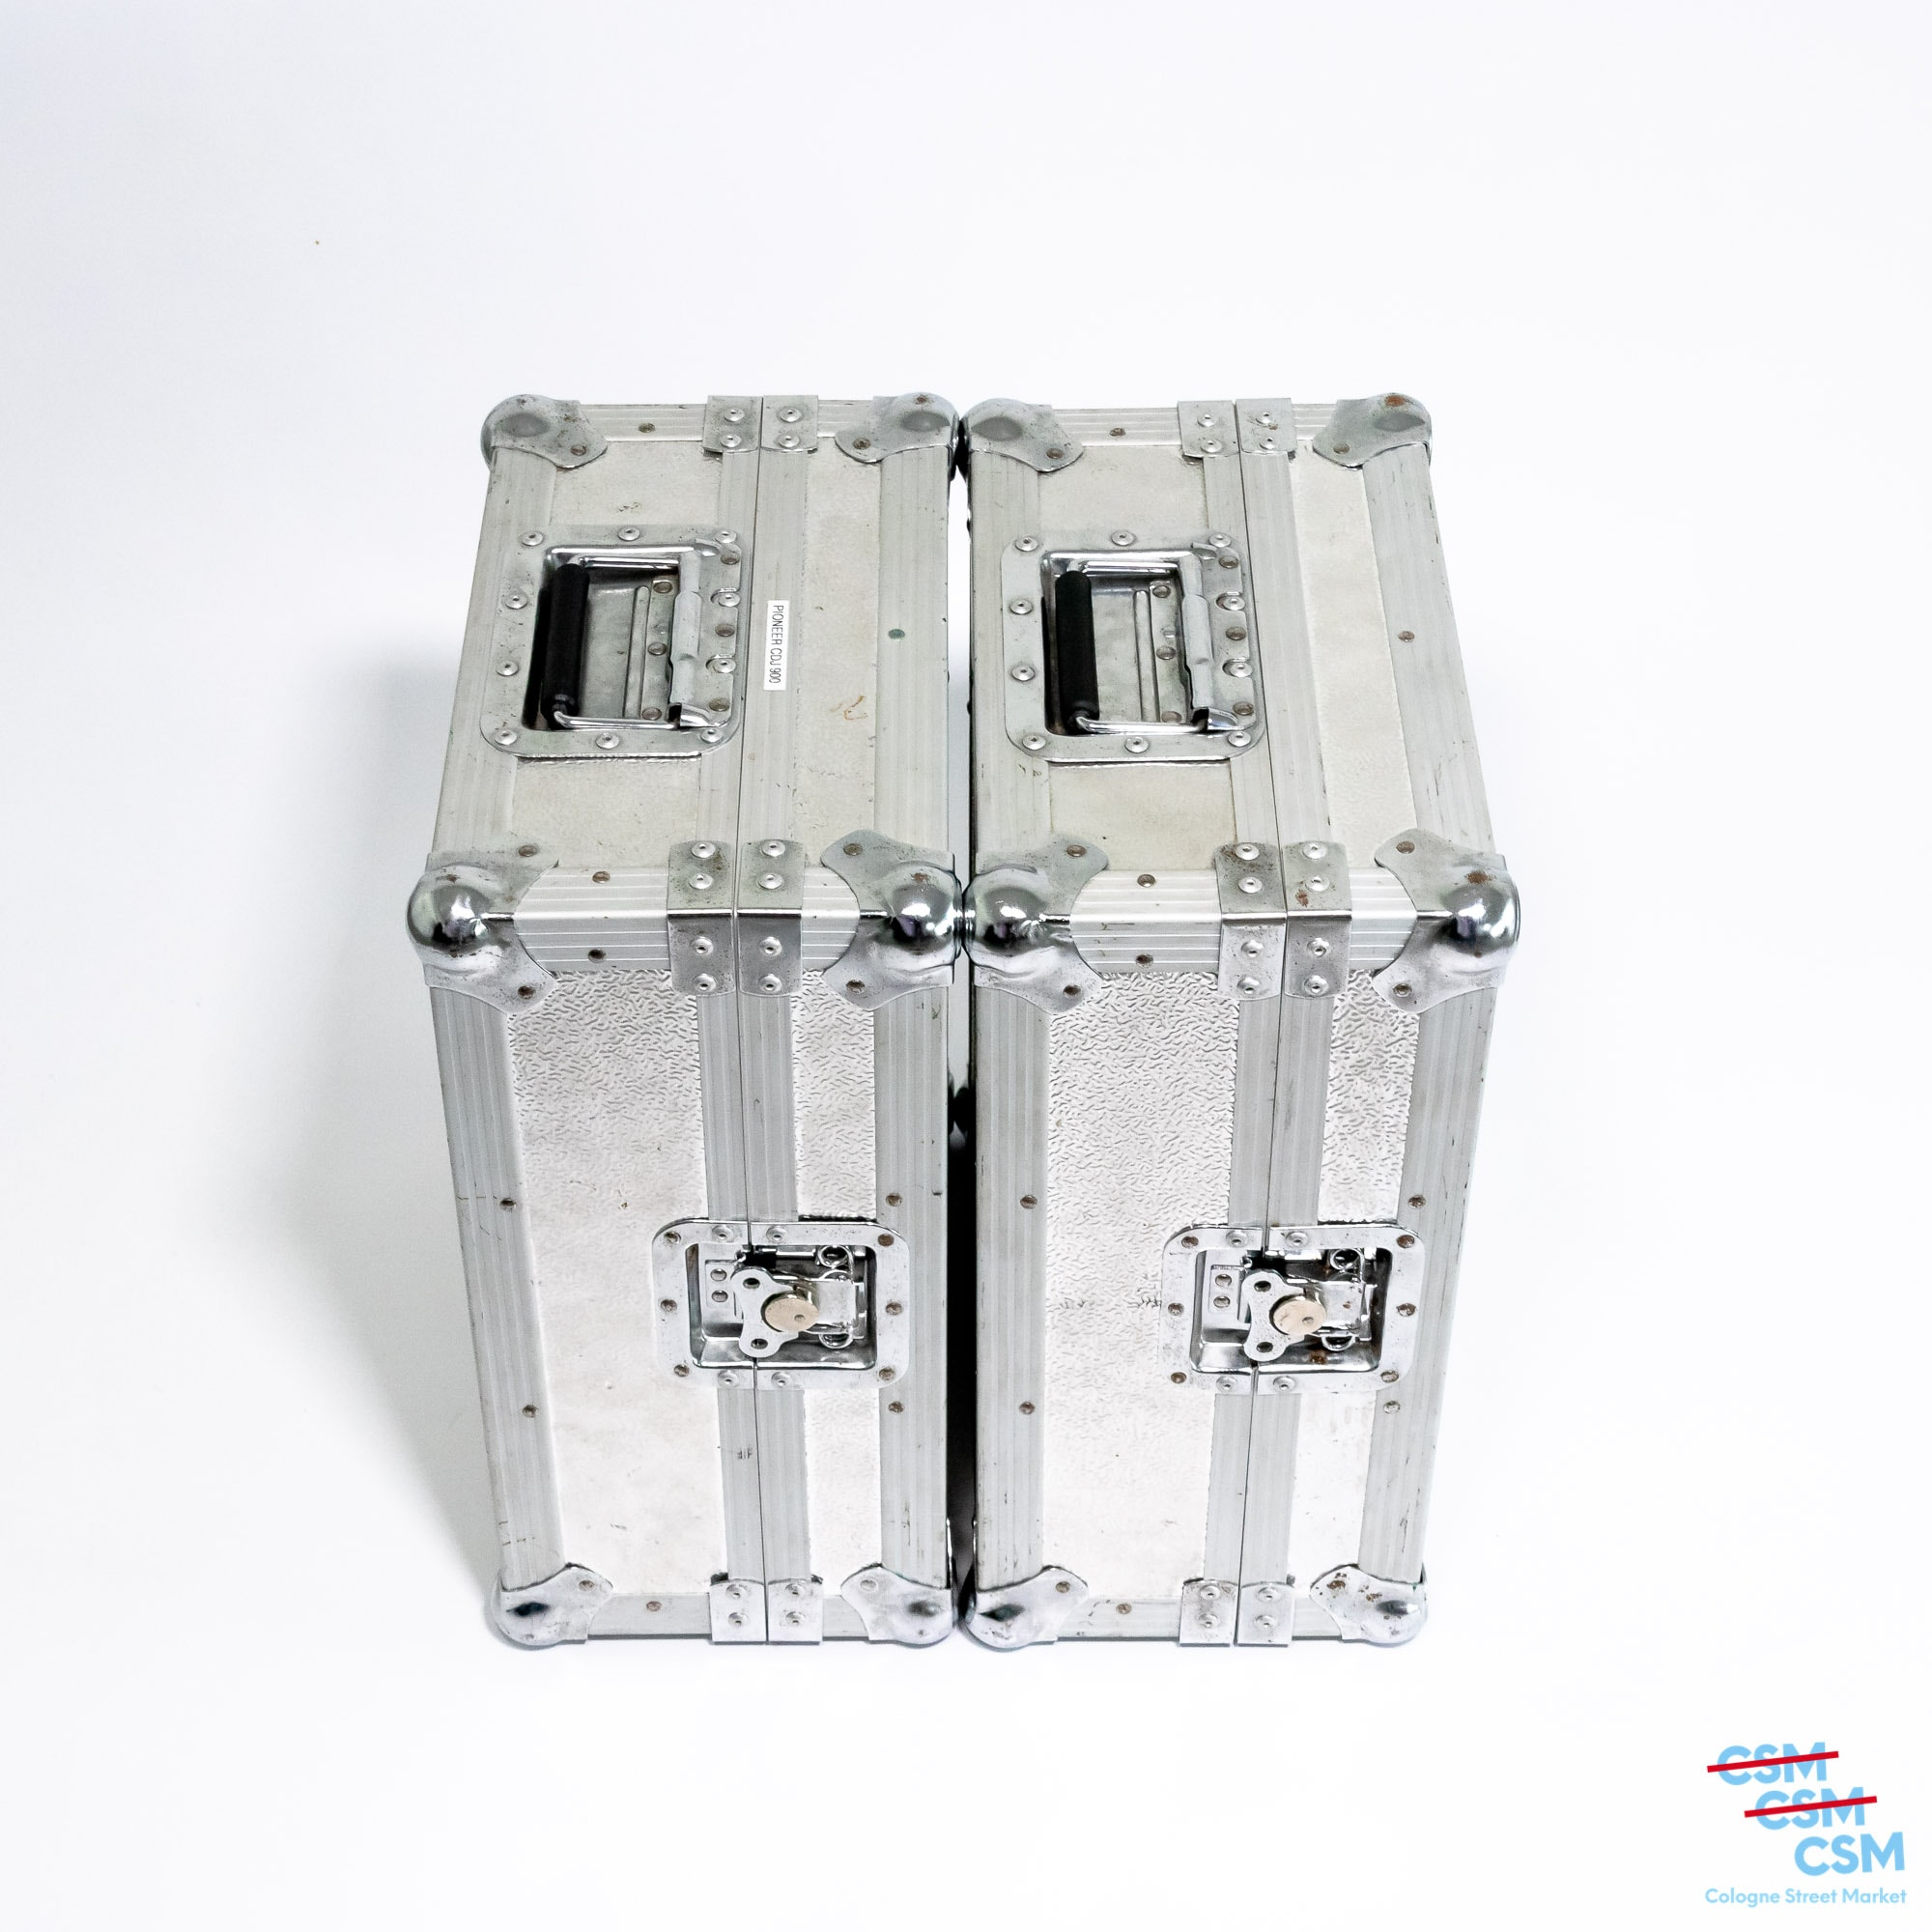 v2er-Paket-Flightcase-Pioneer-DJ-CDJ-900-gebraucht-kaufen